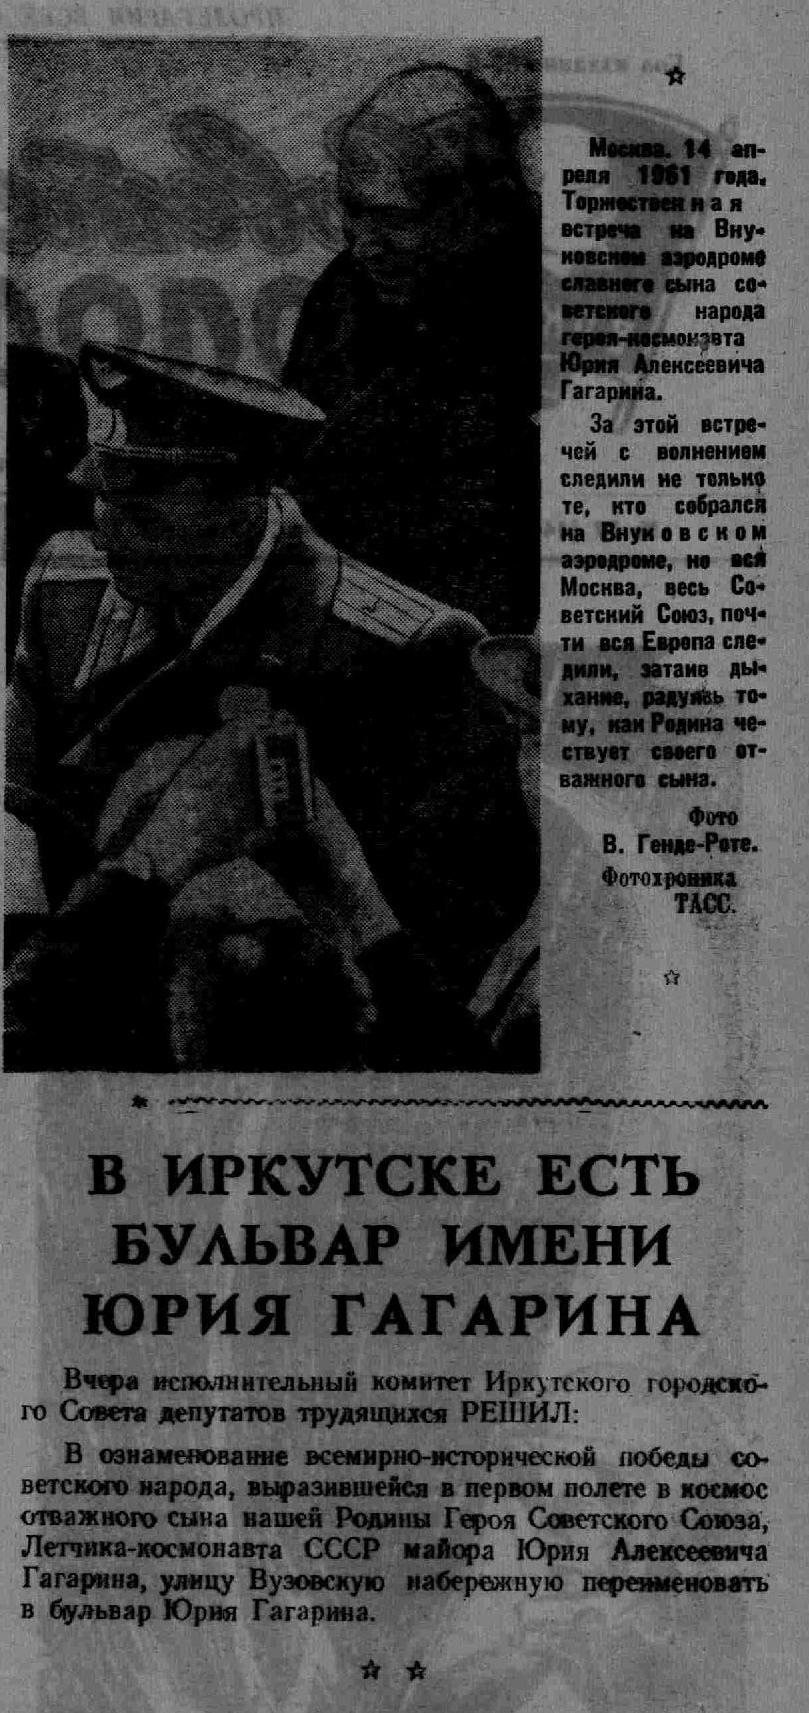 «Советская молодежь». 1961. 18 апр. (№ 77.)